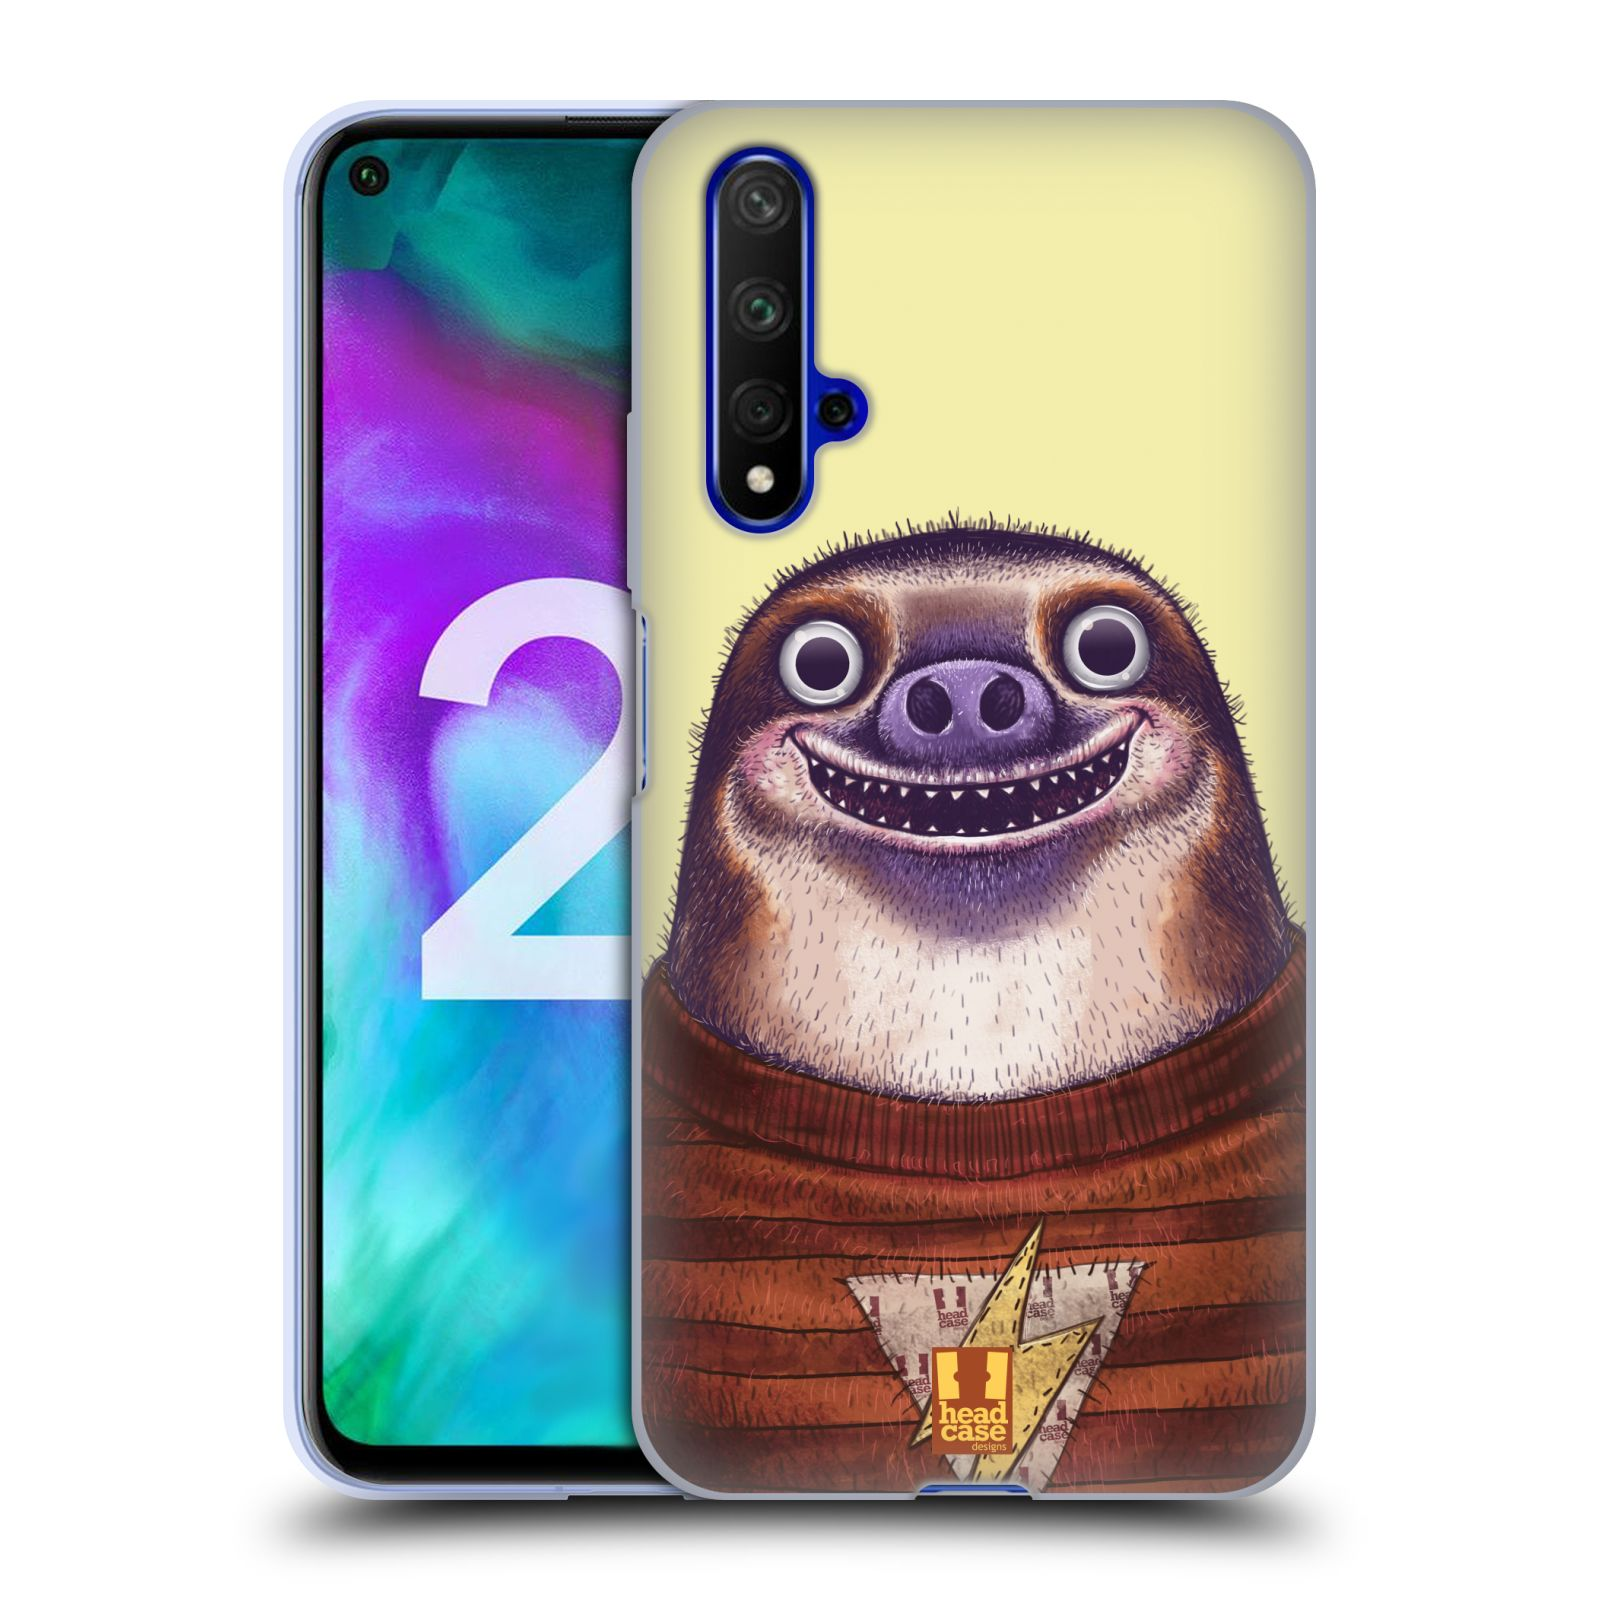 Silikonové pouzdro na mobil Honor 20 - Head Case - ANIMPLA LENOCHOD